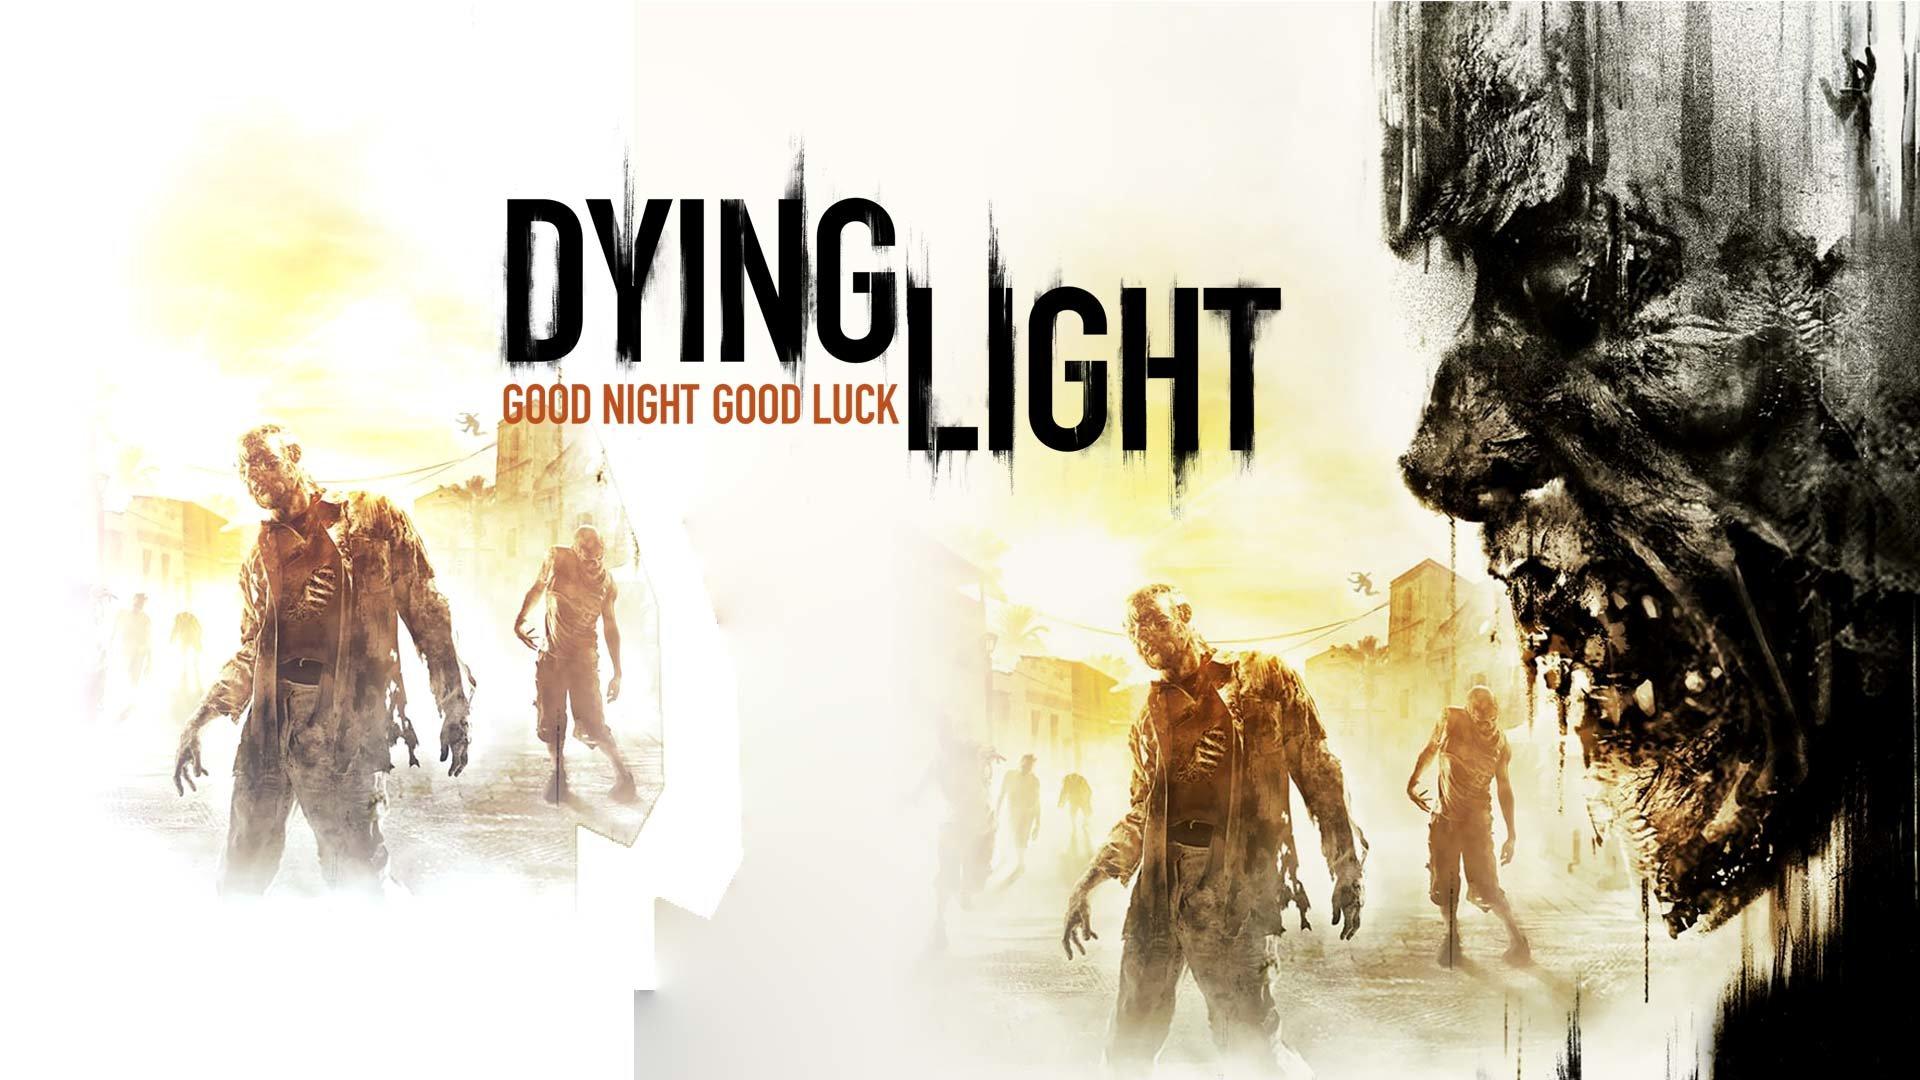 Dying Light Wallpapers 1920x1080 Full Hd 1080p Desktop Backgrounds